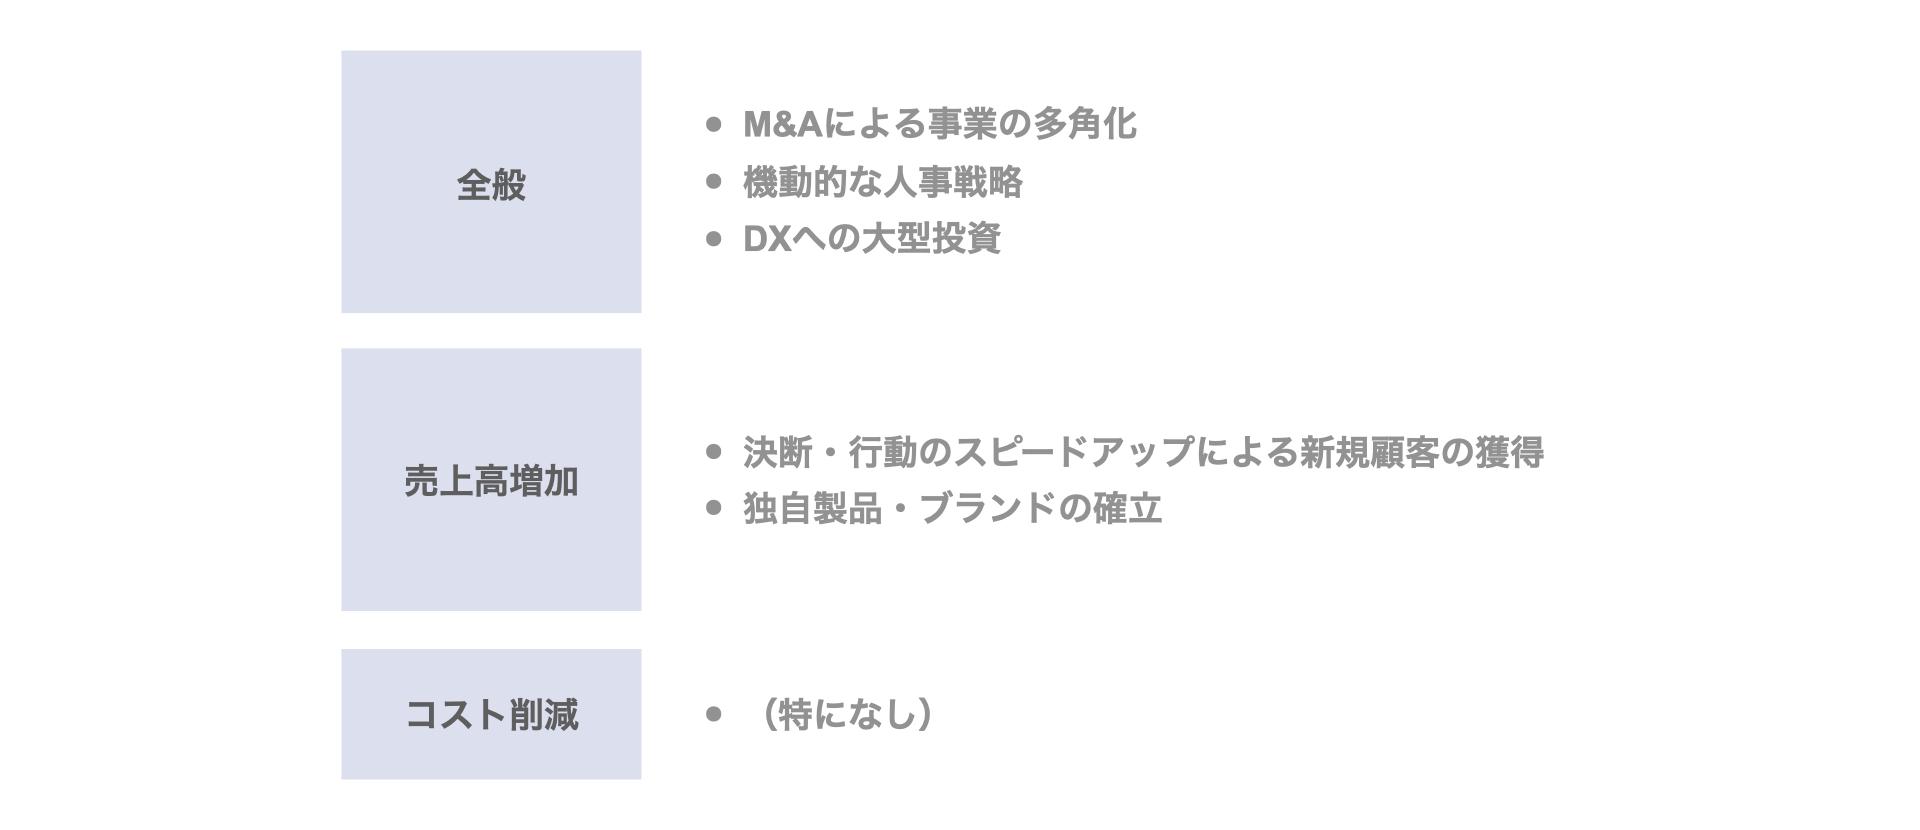 MBO事例 愛光電気のデットMBOによる非公開化(横浜銀行)の非公開化後の経営方針